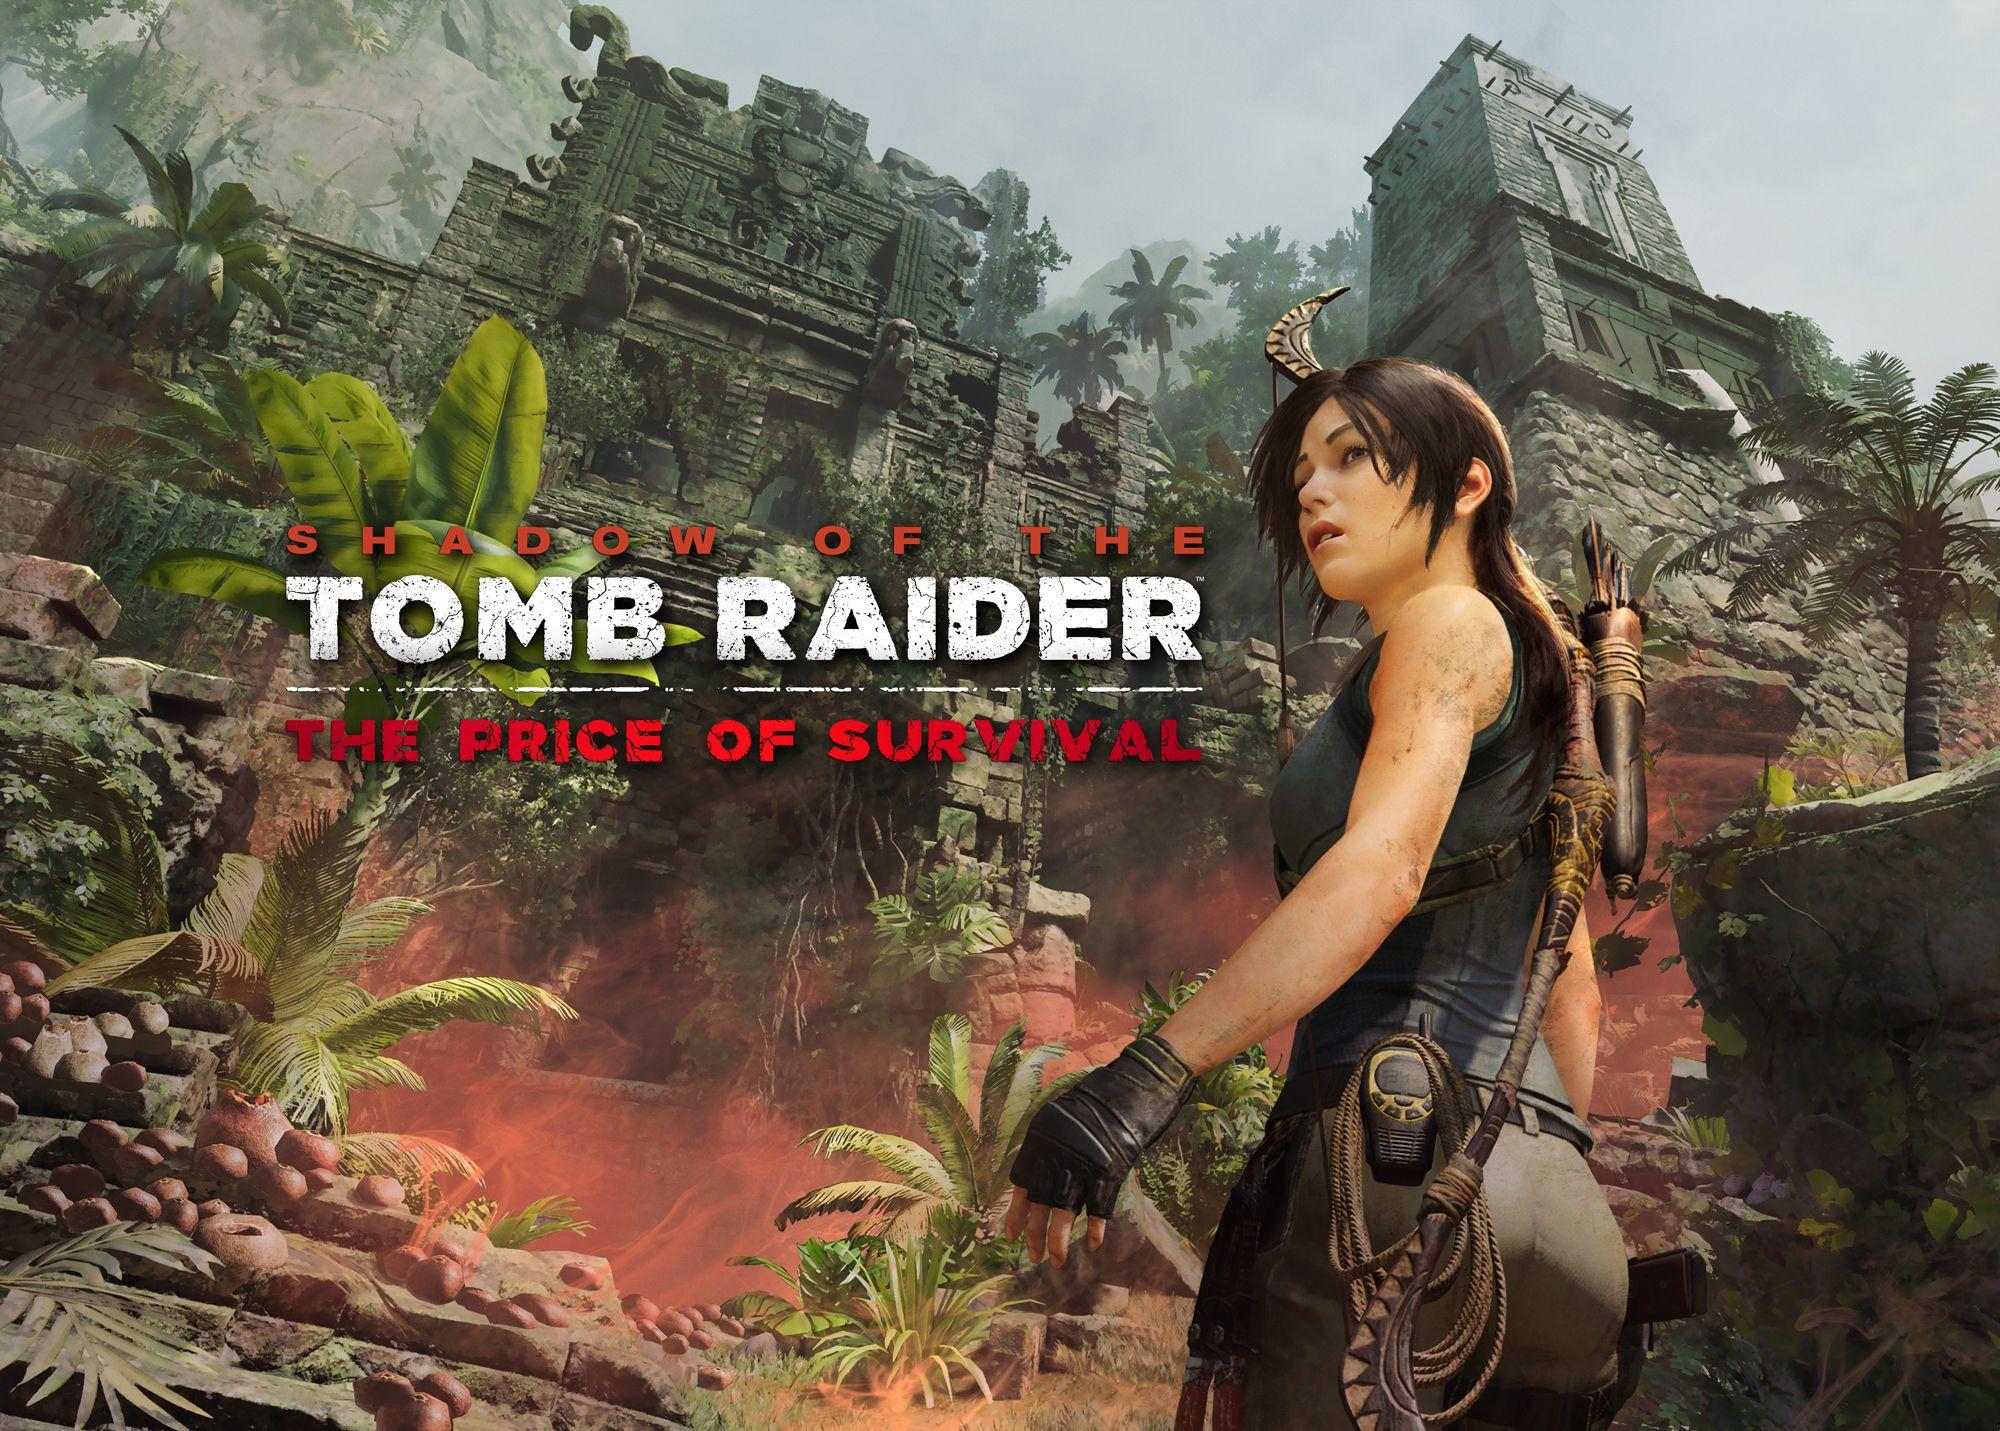 古墓奇兵 暗影 Dlc The Price Of Survival 今日發售 動作 Steamxo Tomb Raider Tomb Tomb Raider Lara Croft